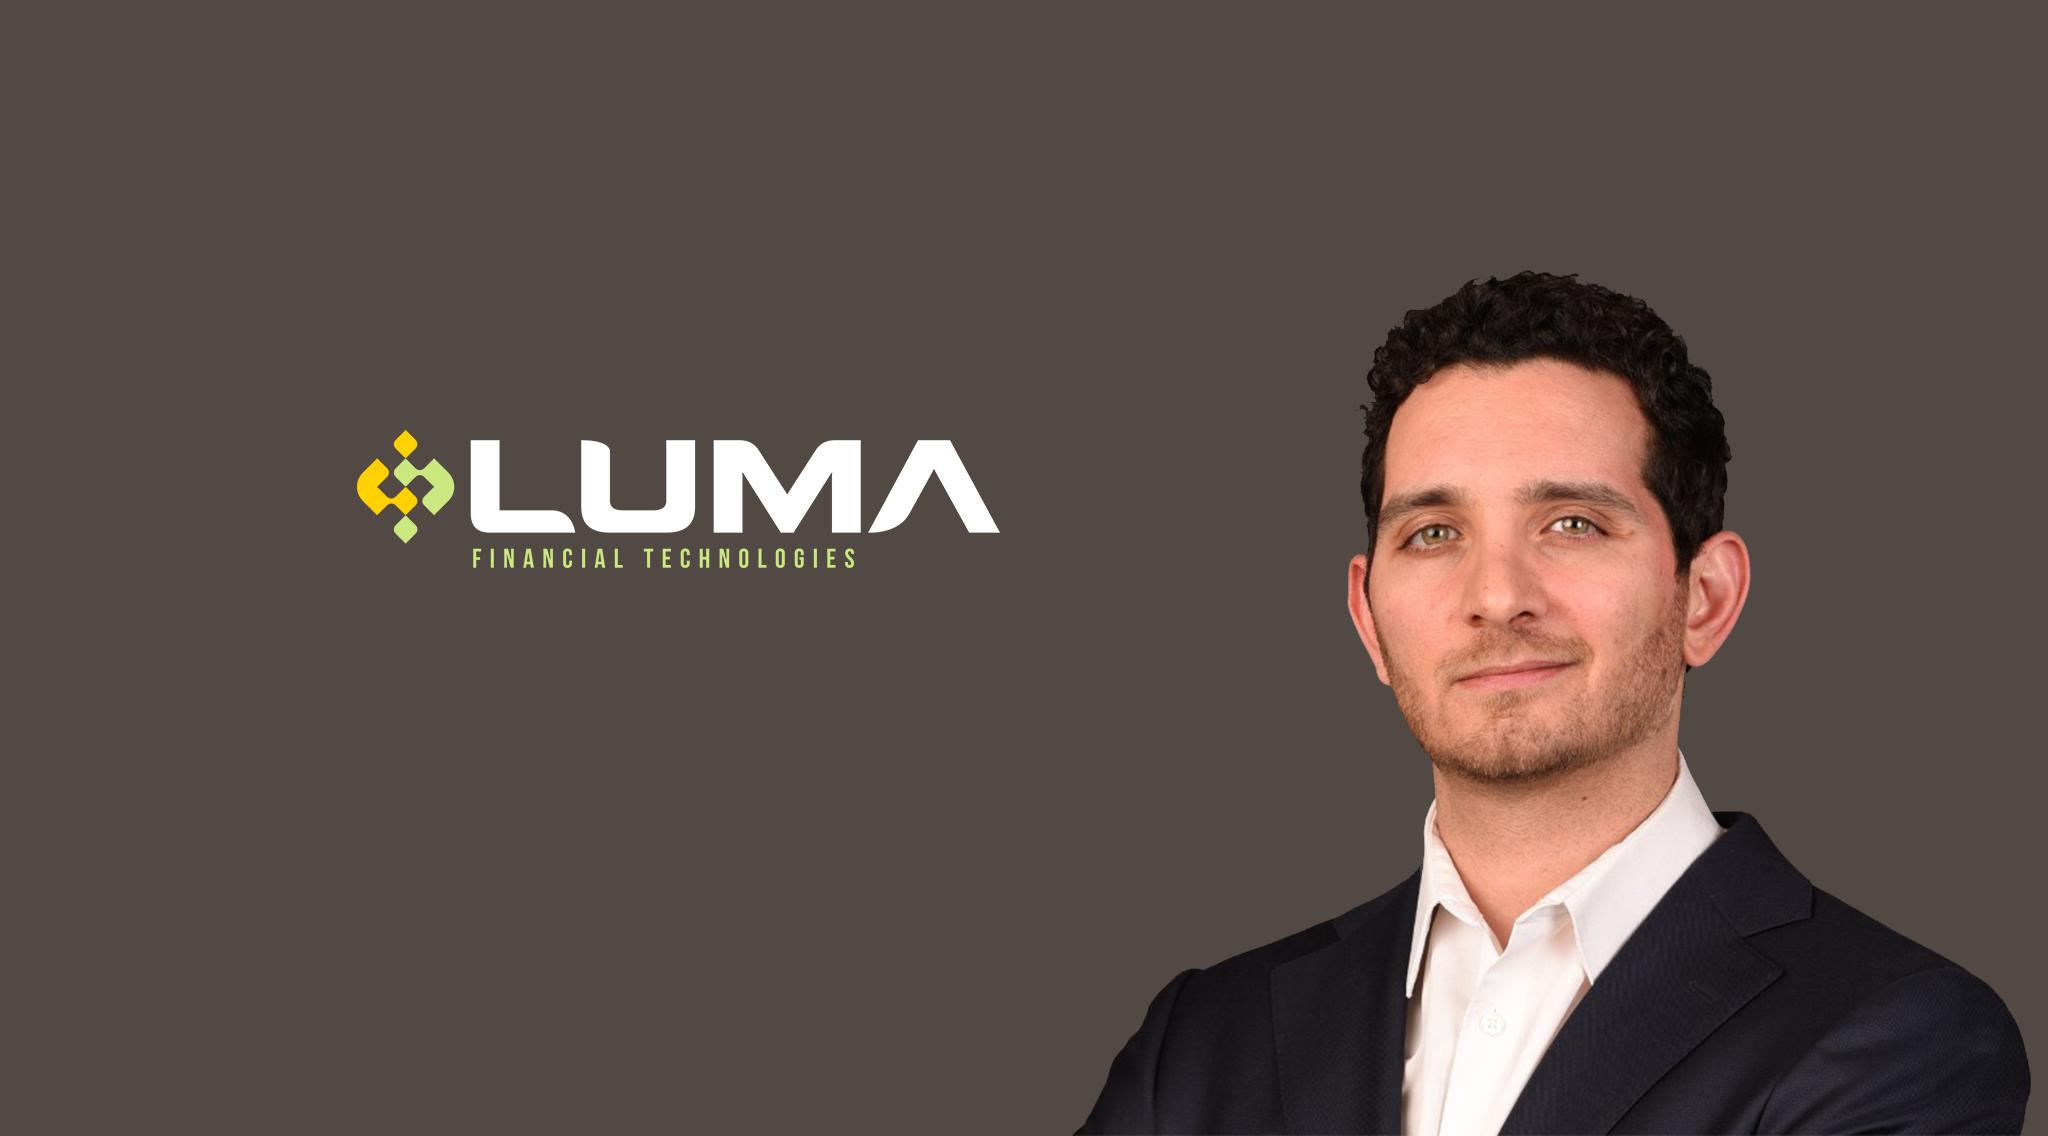 Luma Financial Technologies